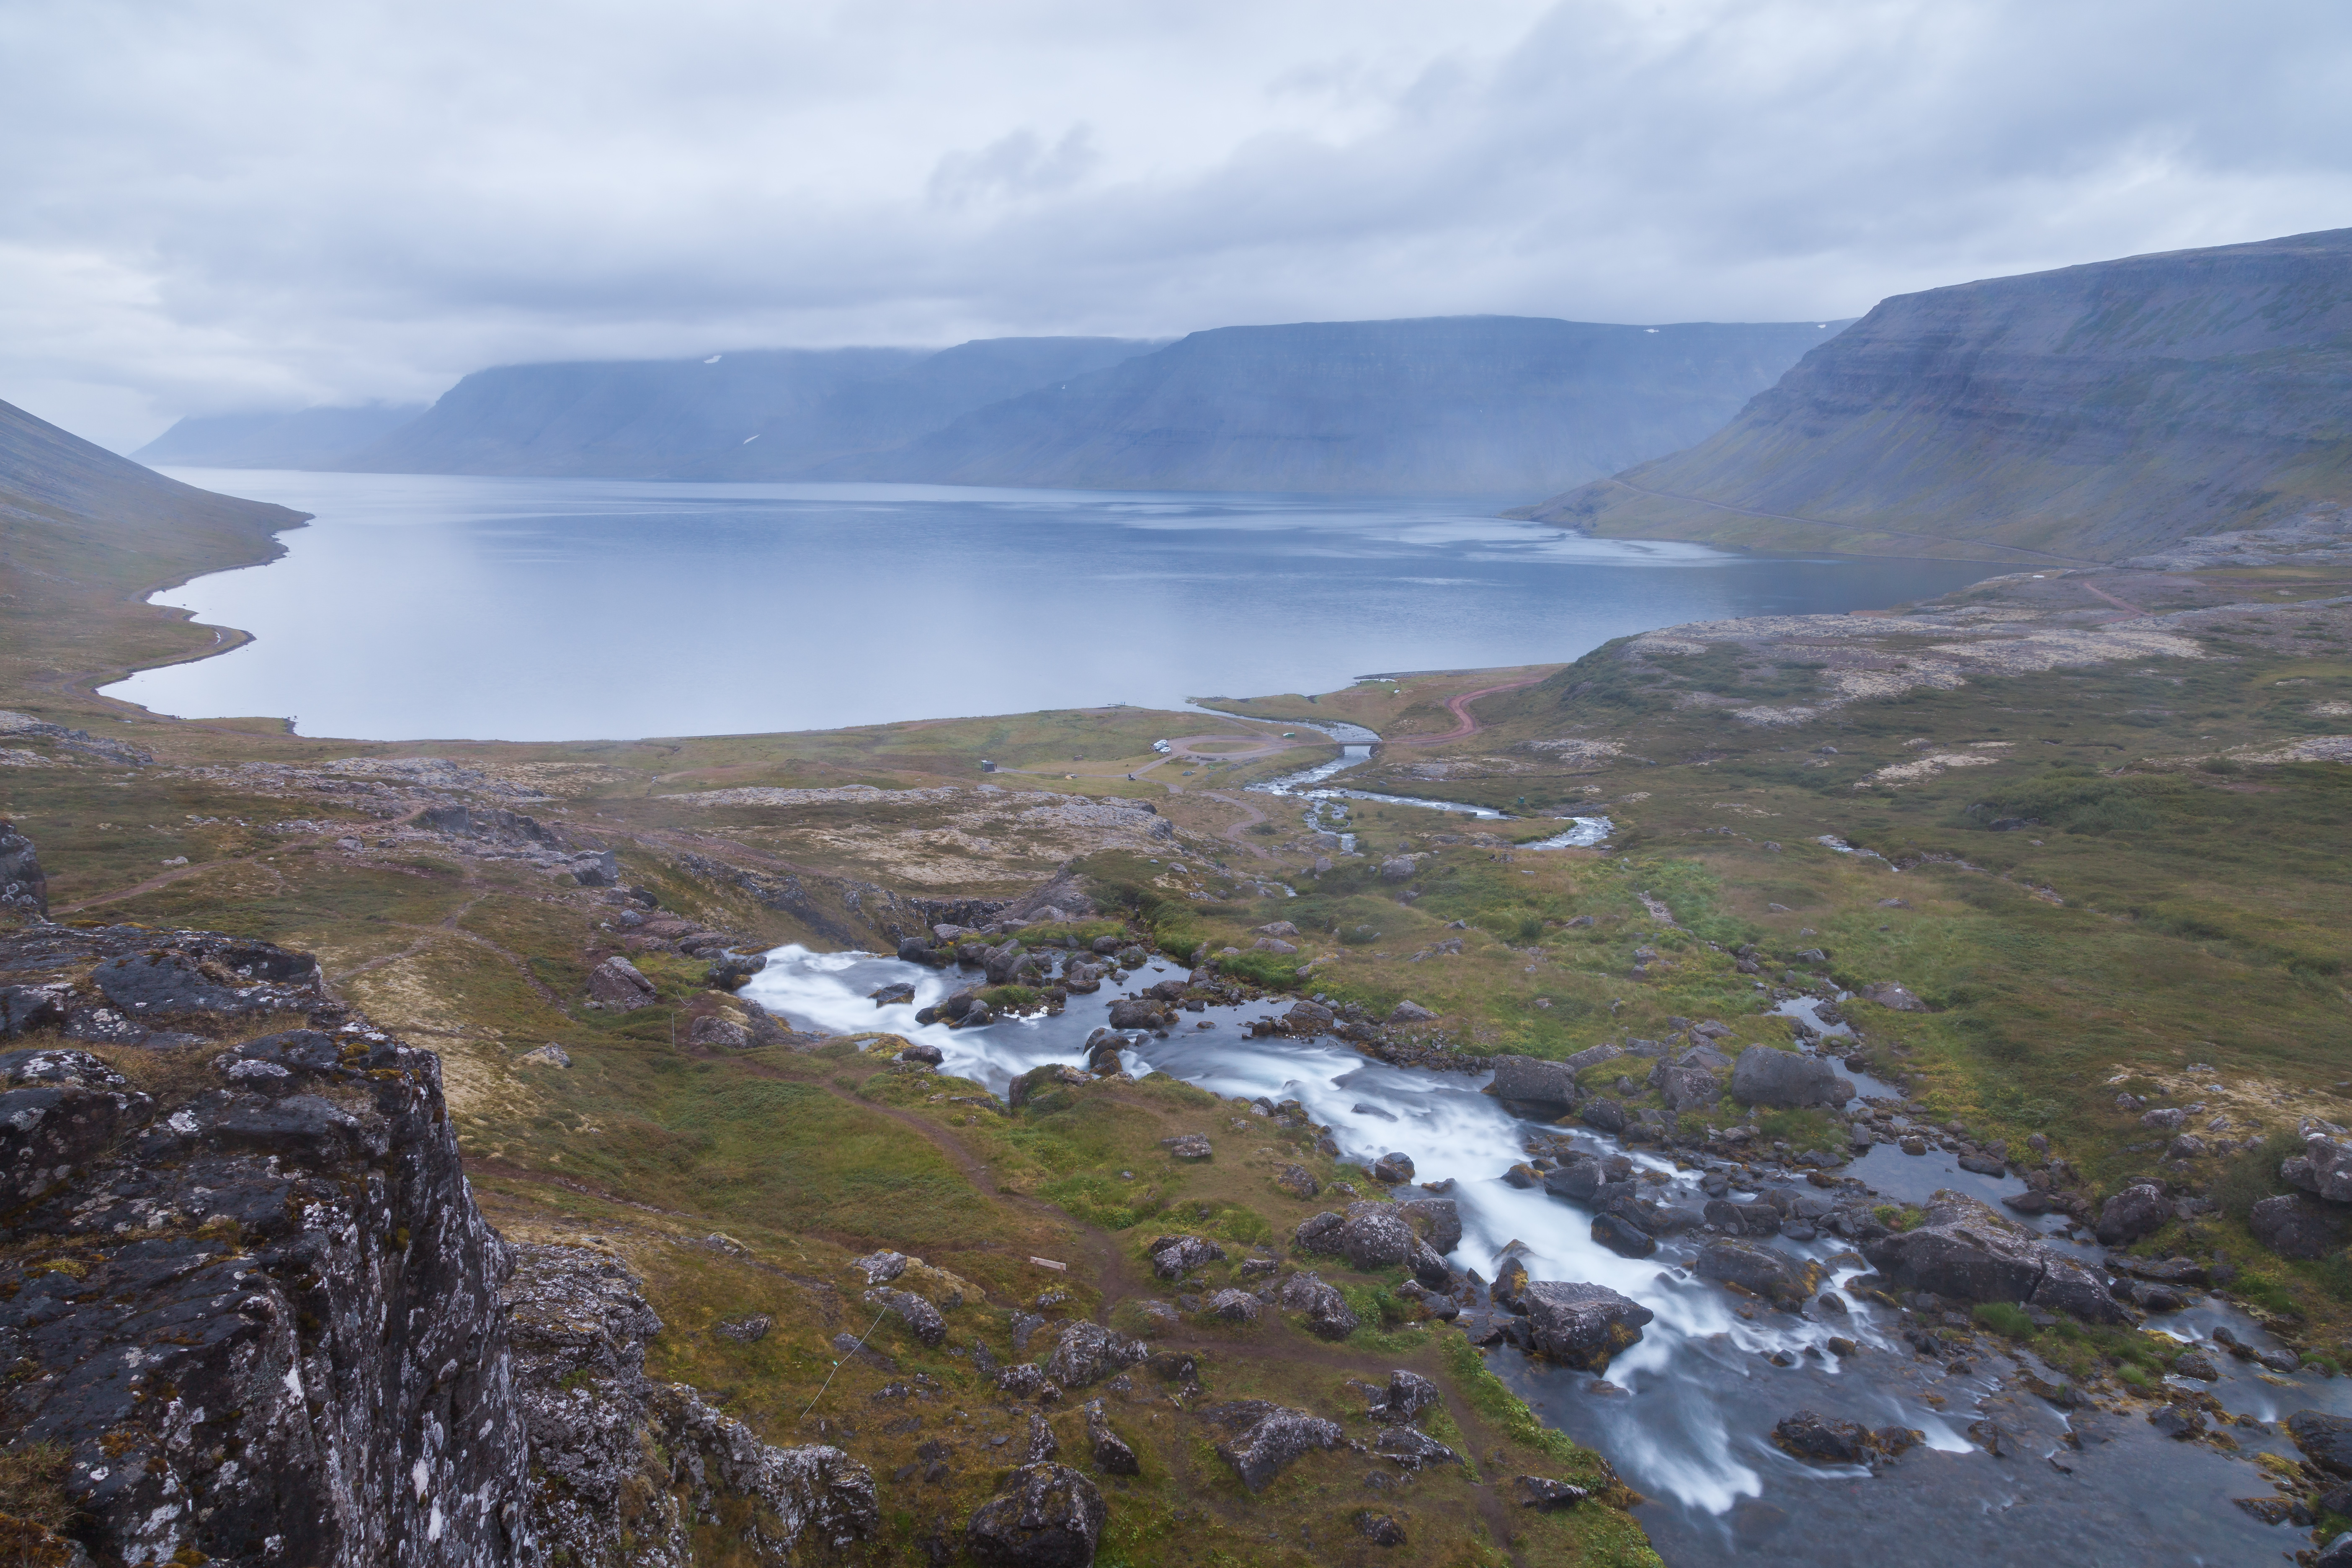 Filrío Dynjandisá, Vestfirðir, Islandia, 20140814, Dd